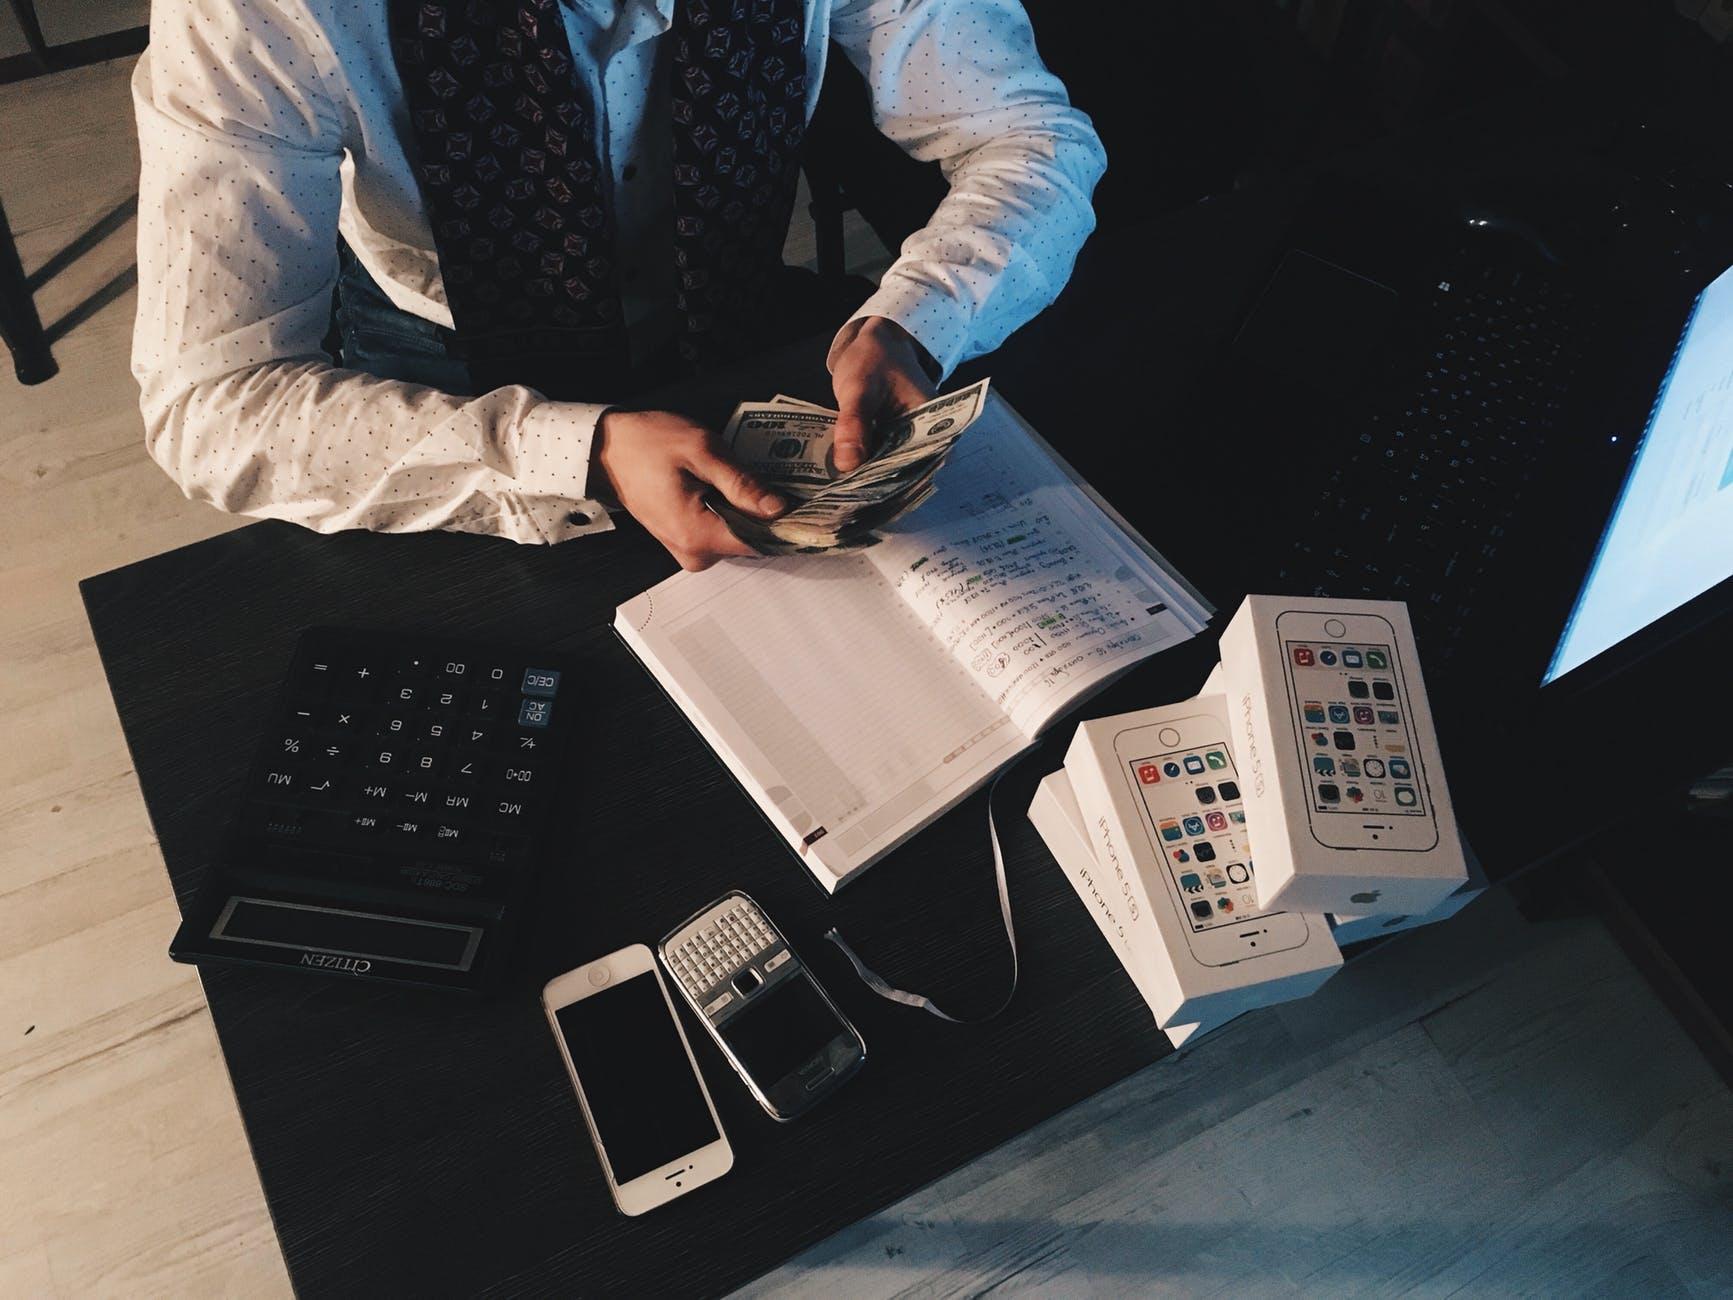 5 tópicos financeiros que todo empreendedor deve saber